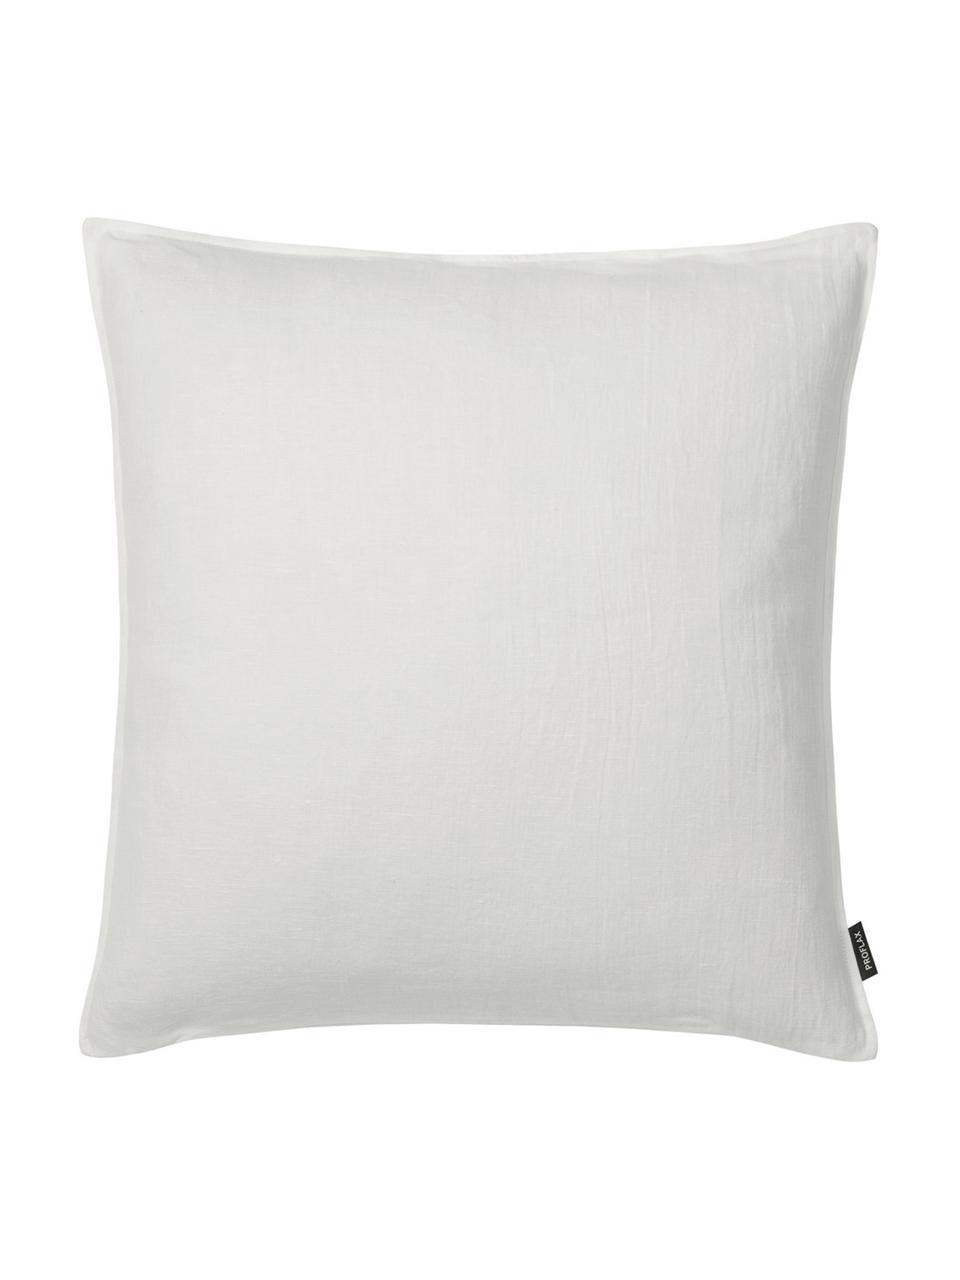 Federa arredo in lino avorio Sven, Lino, Bianco latteo, Larg. 50 x Lung. 50 cm